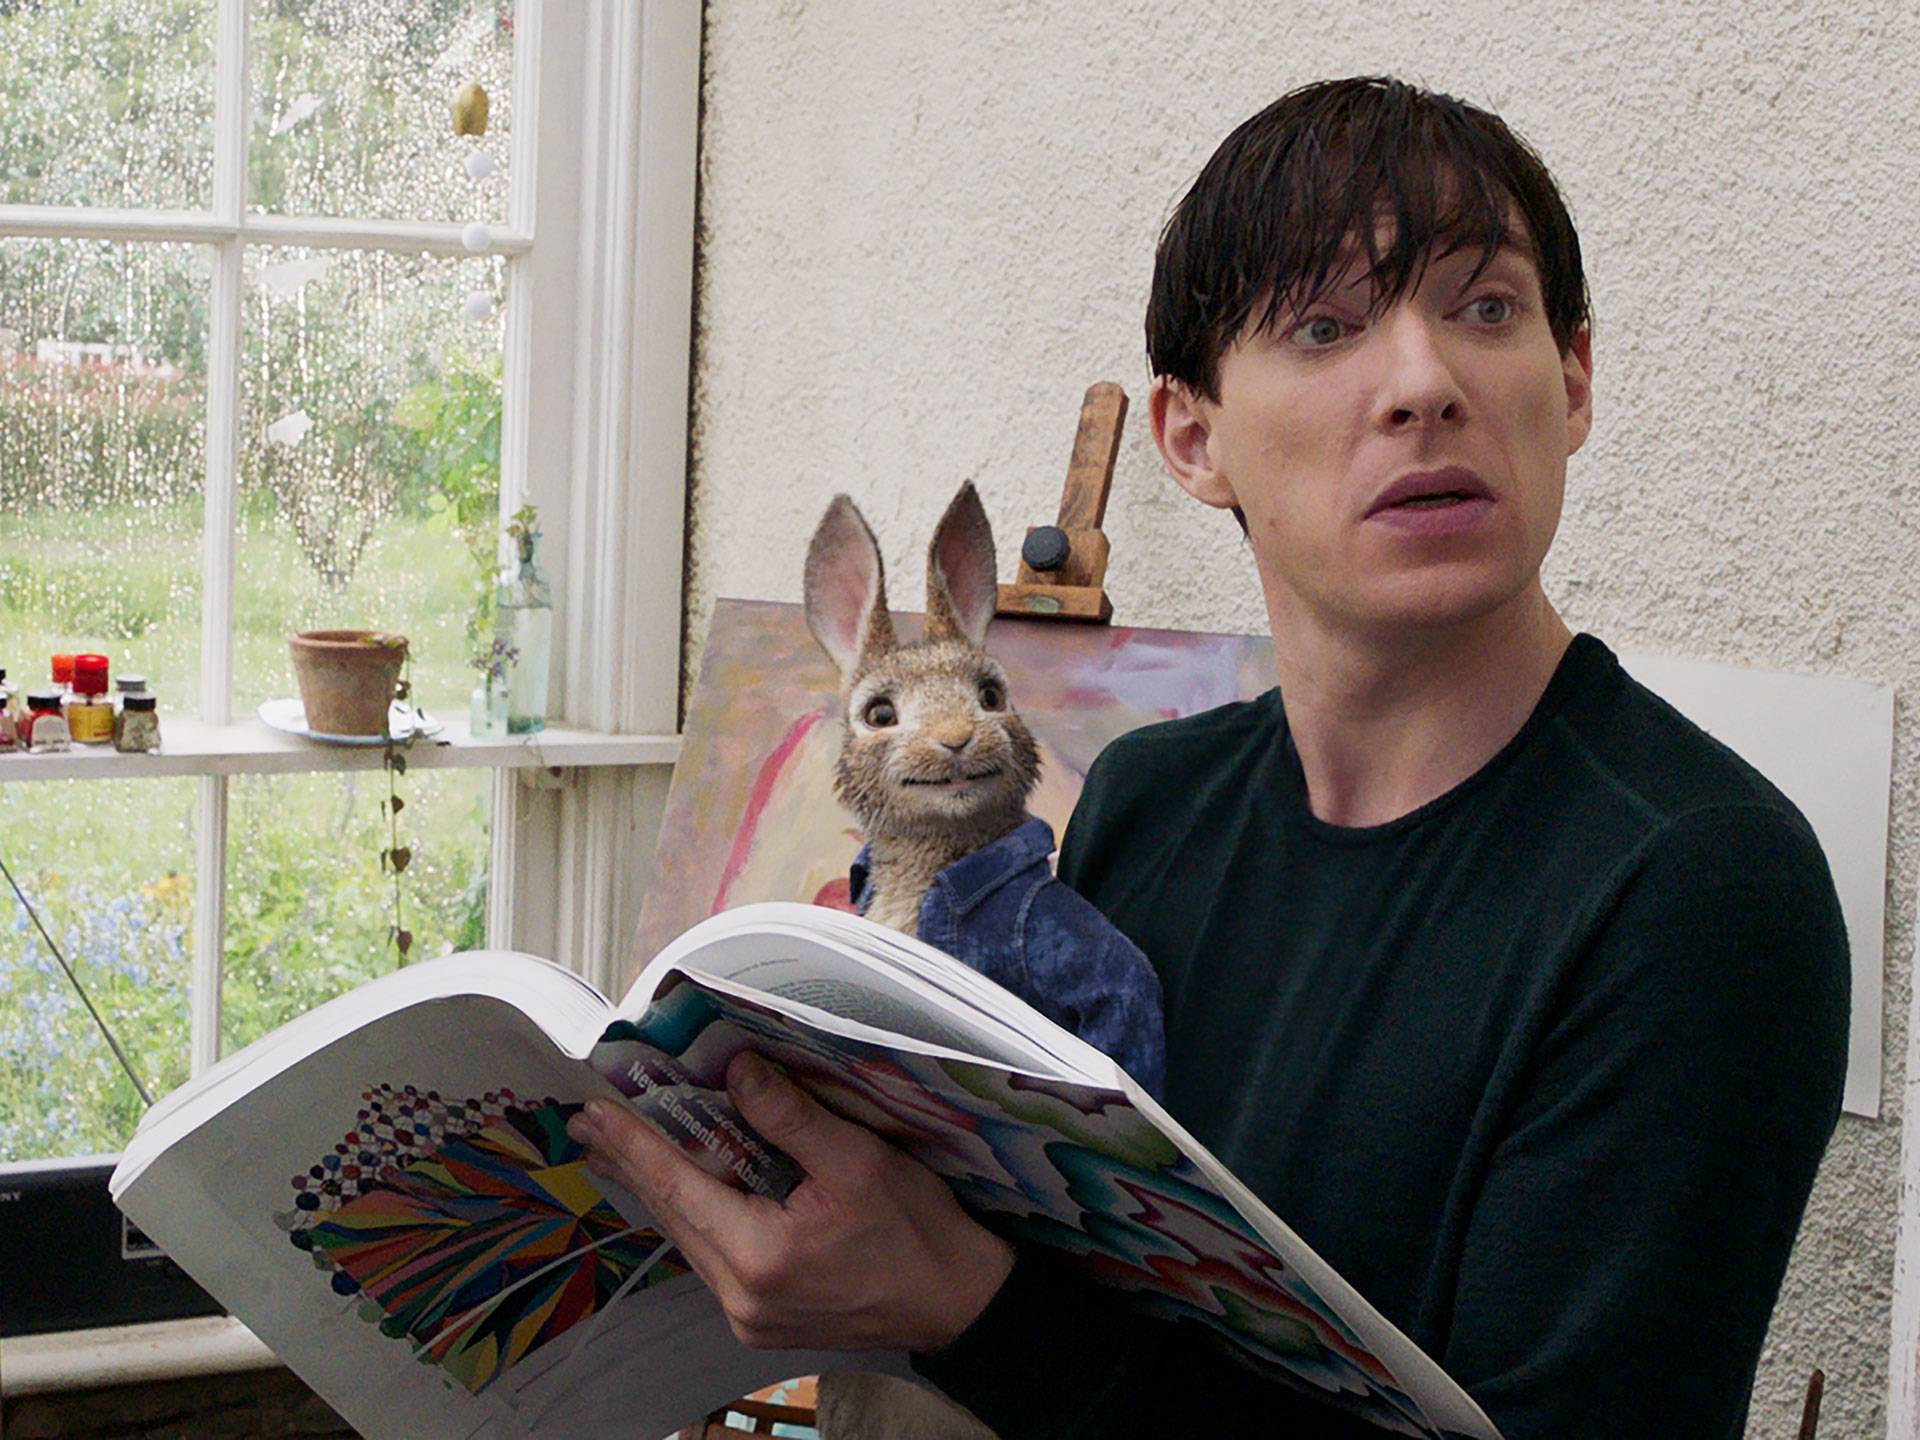 mgid:file:gsp:scenic:/international/nick-intl/images/series/orange-carpet/ep-24-peter-rabbit/peter-rabbit-06.jpg